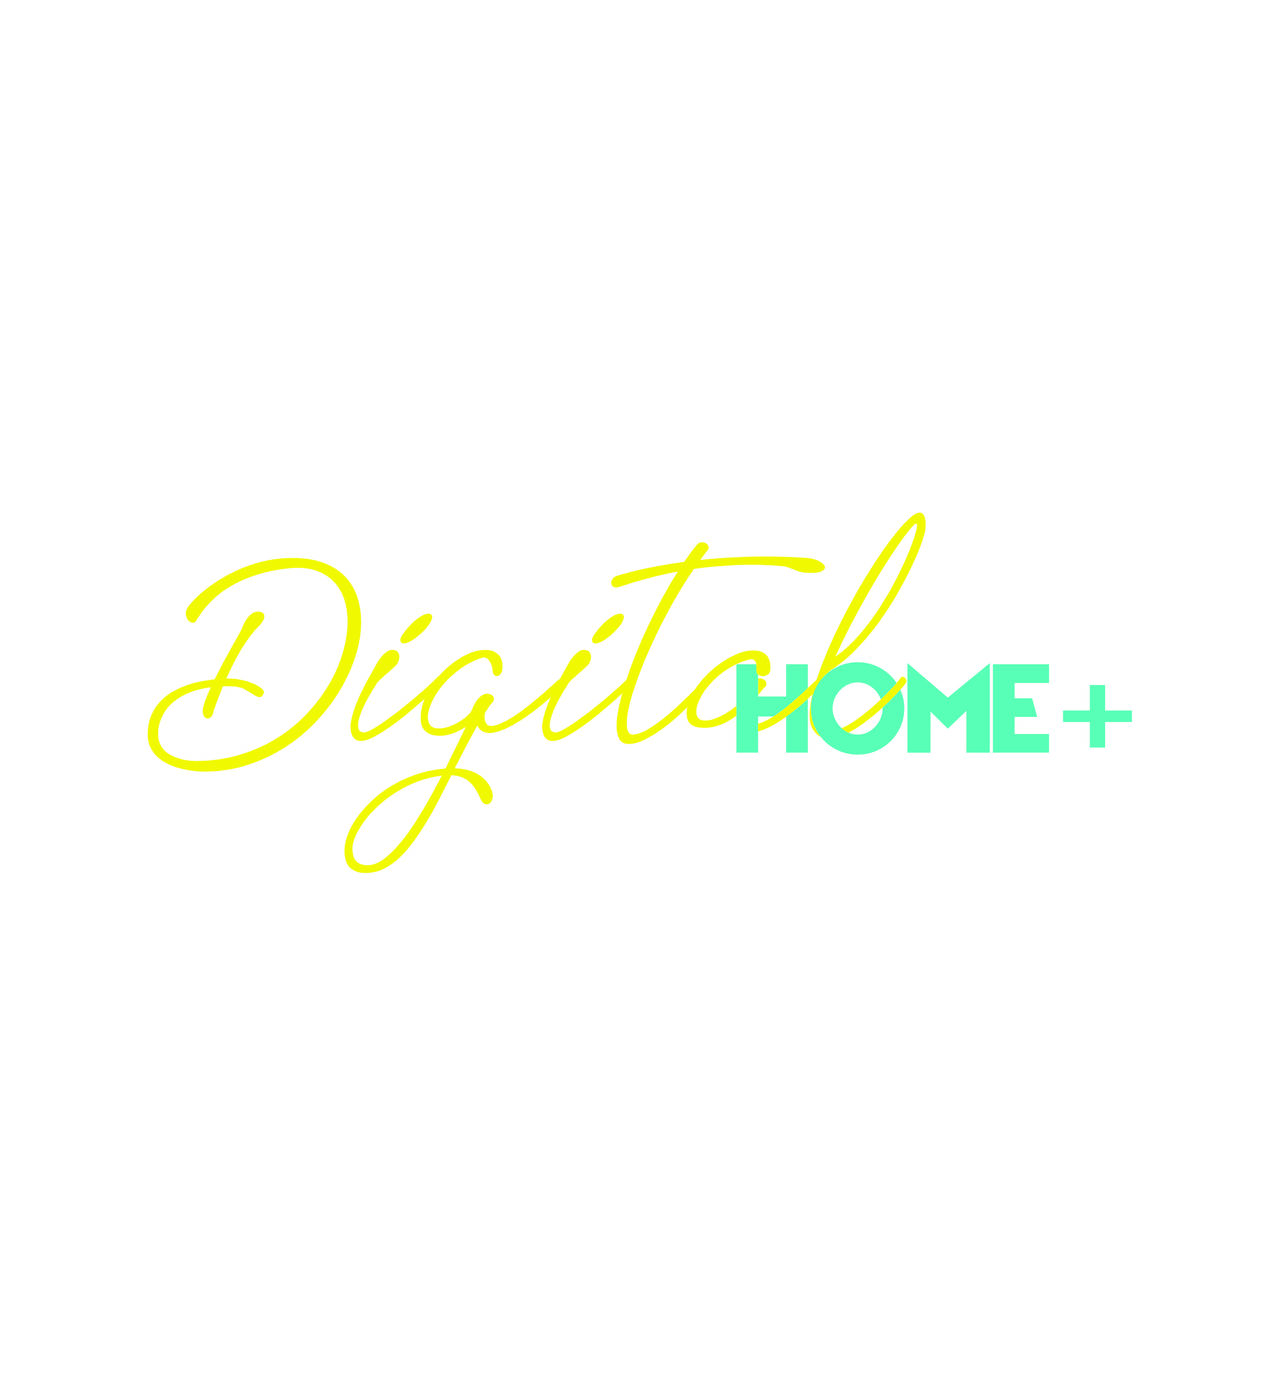 Digital Home +